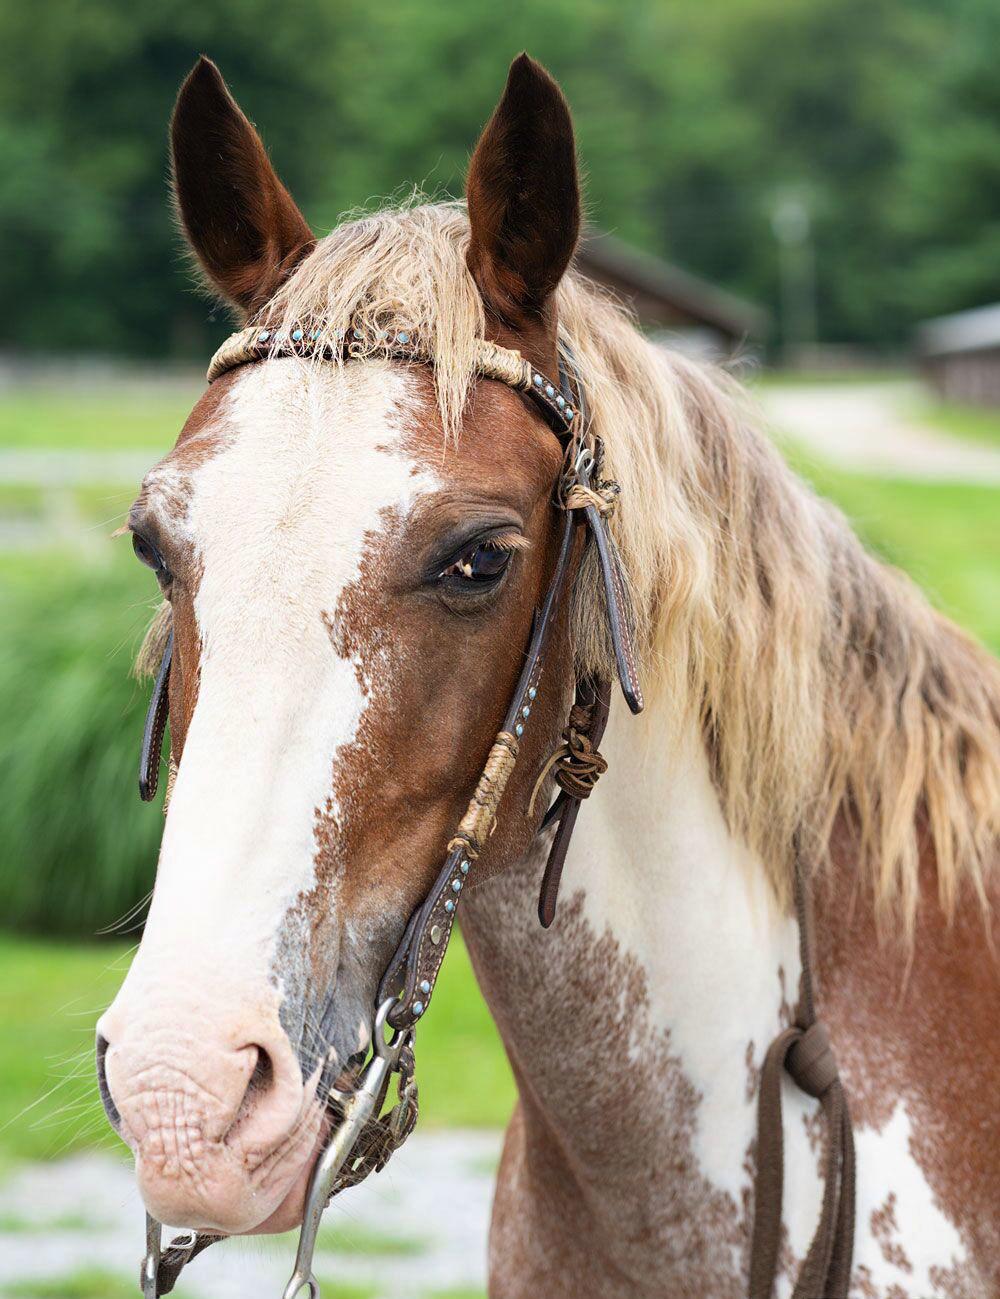 Embracing the mountain spirit on horseback